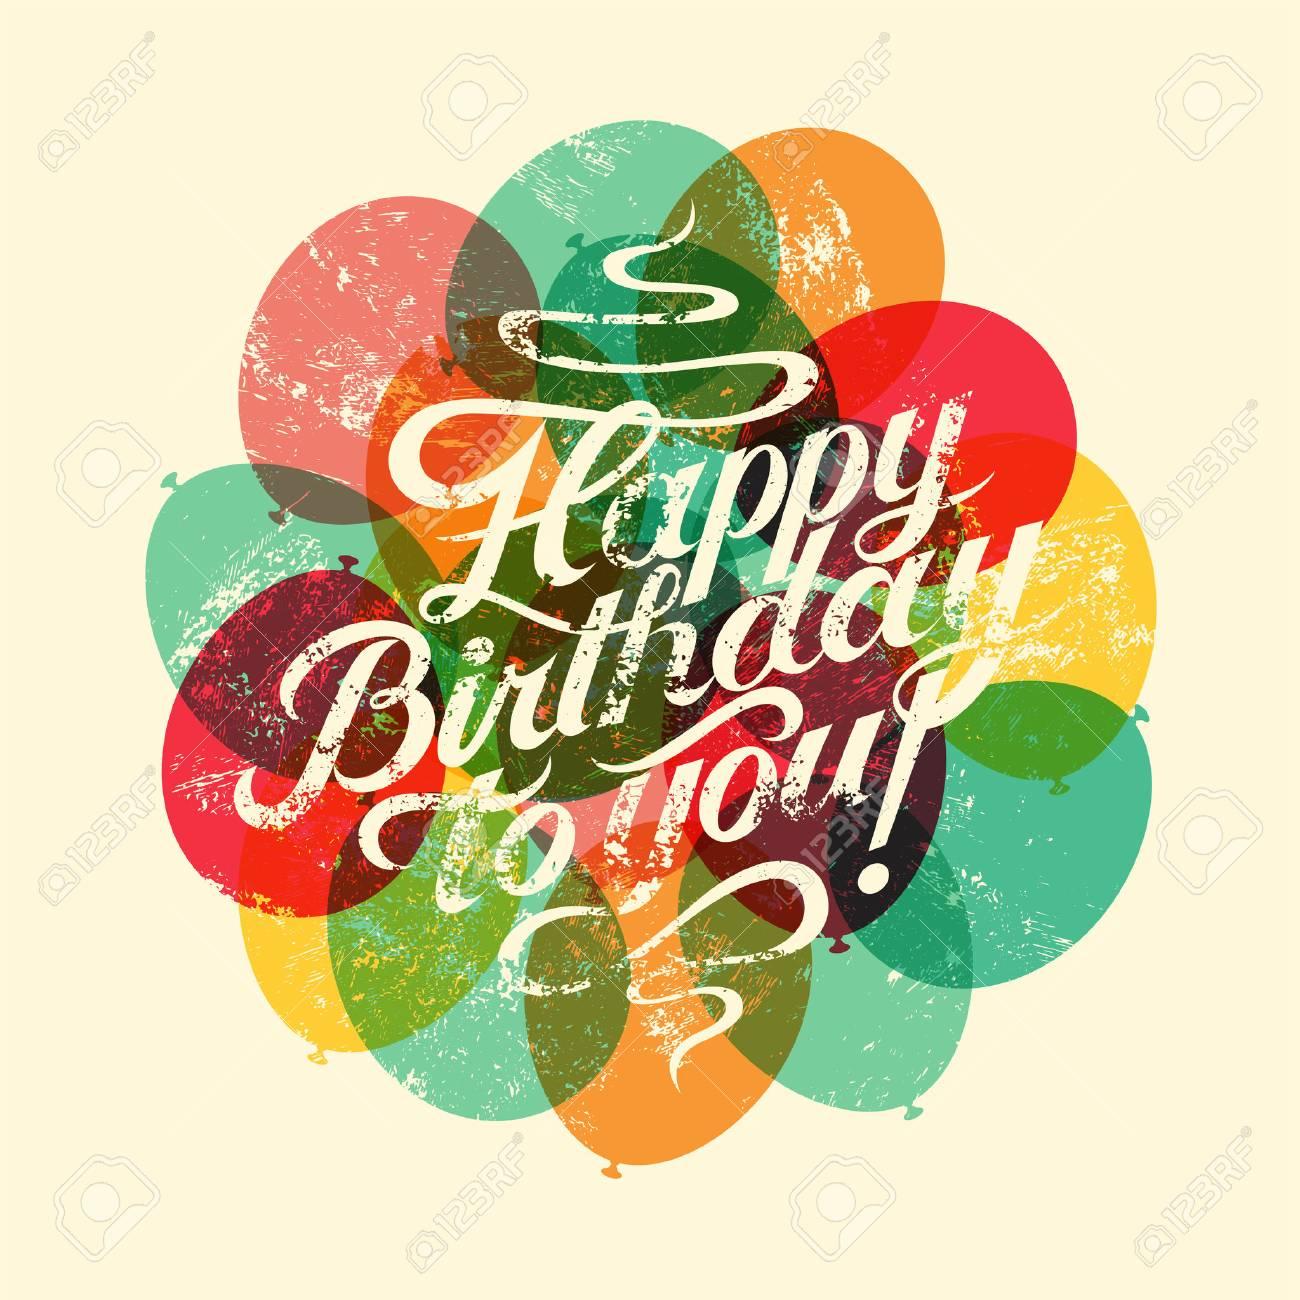 Happy birthday to you typographical retro grunge birthday card happy birthday to you typographical retro grunge birthday card vector illustration stock vector bookmarktalkfo Choice Image